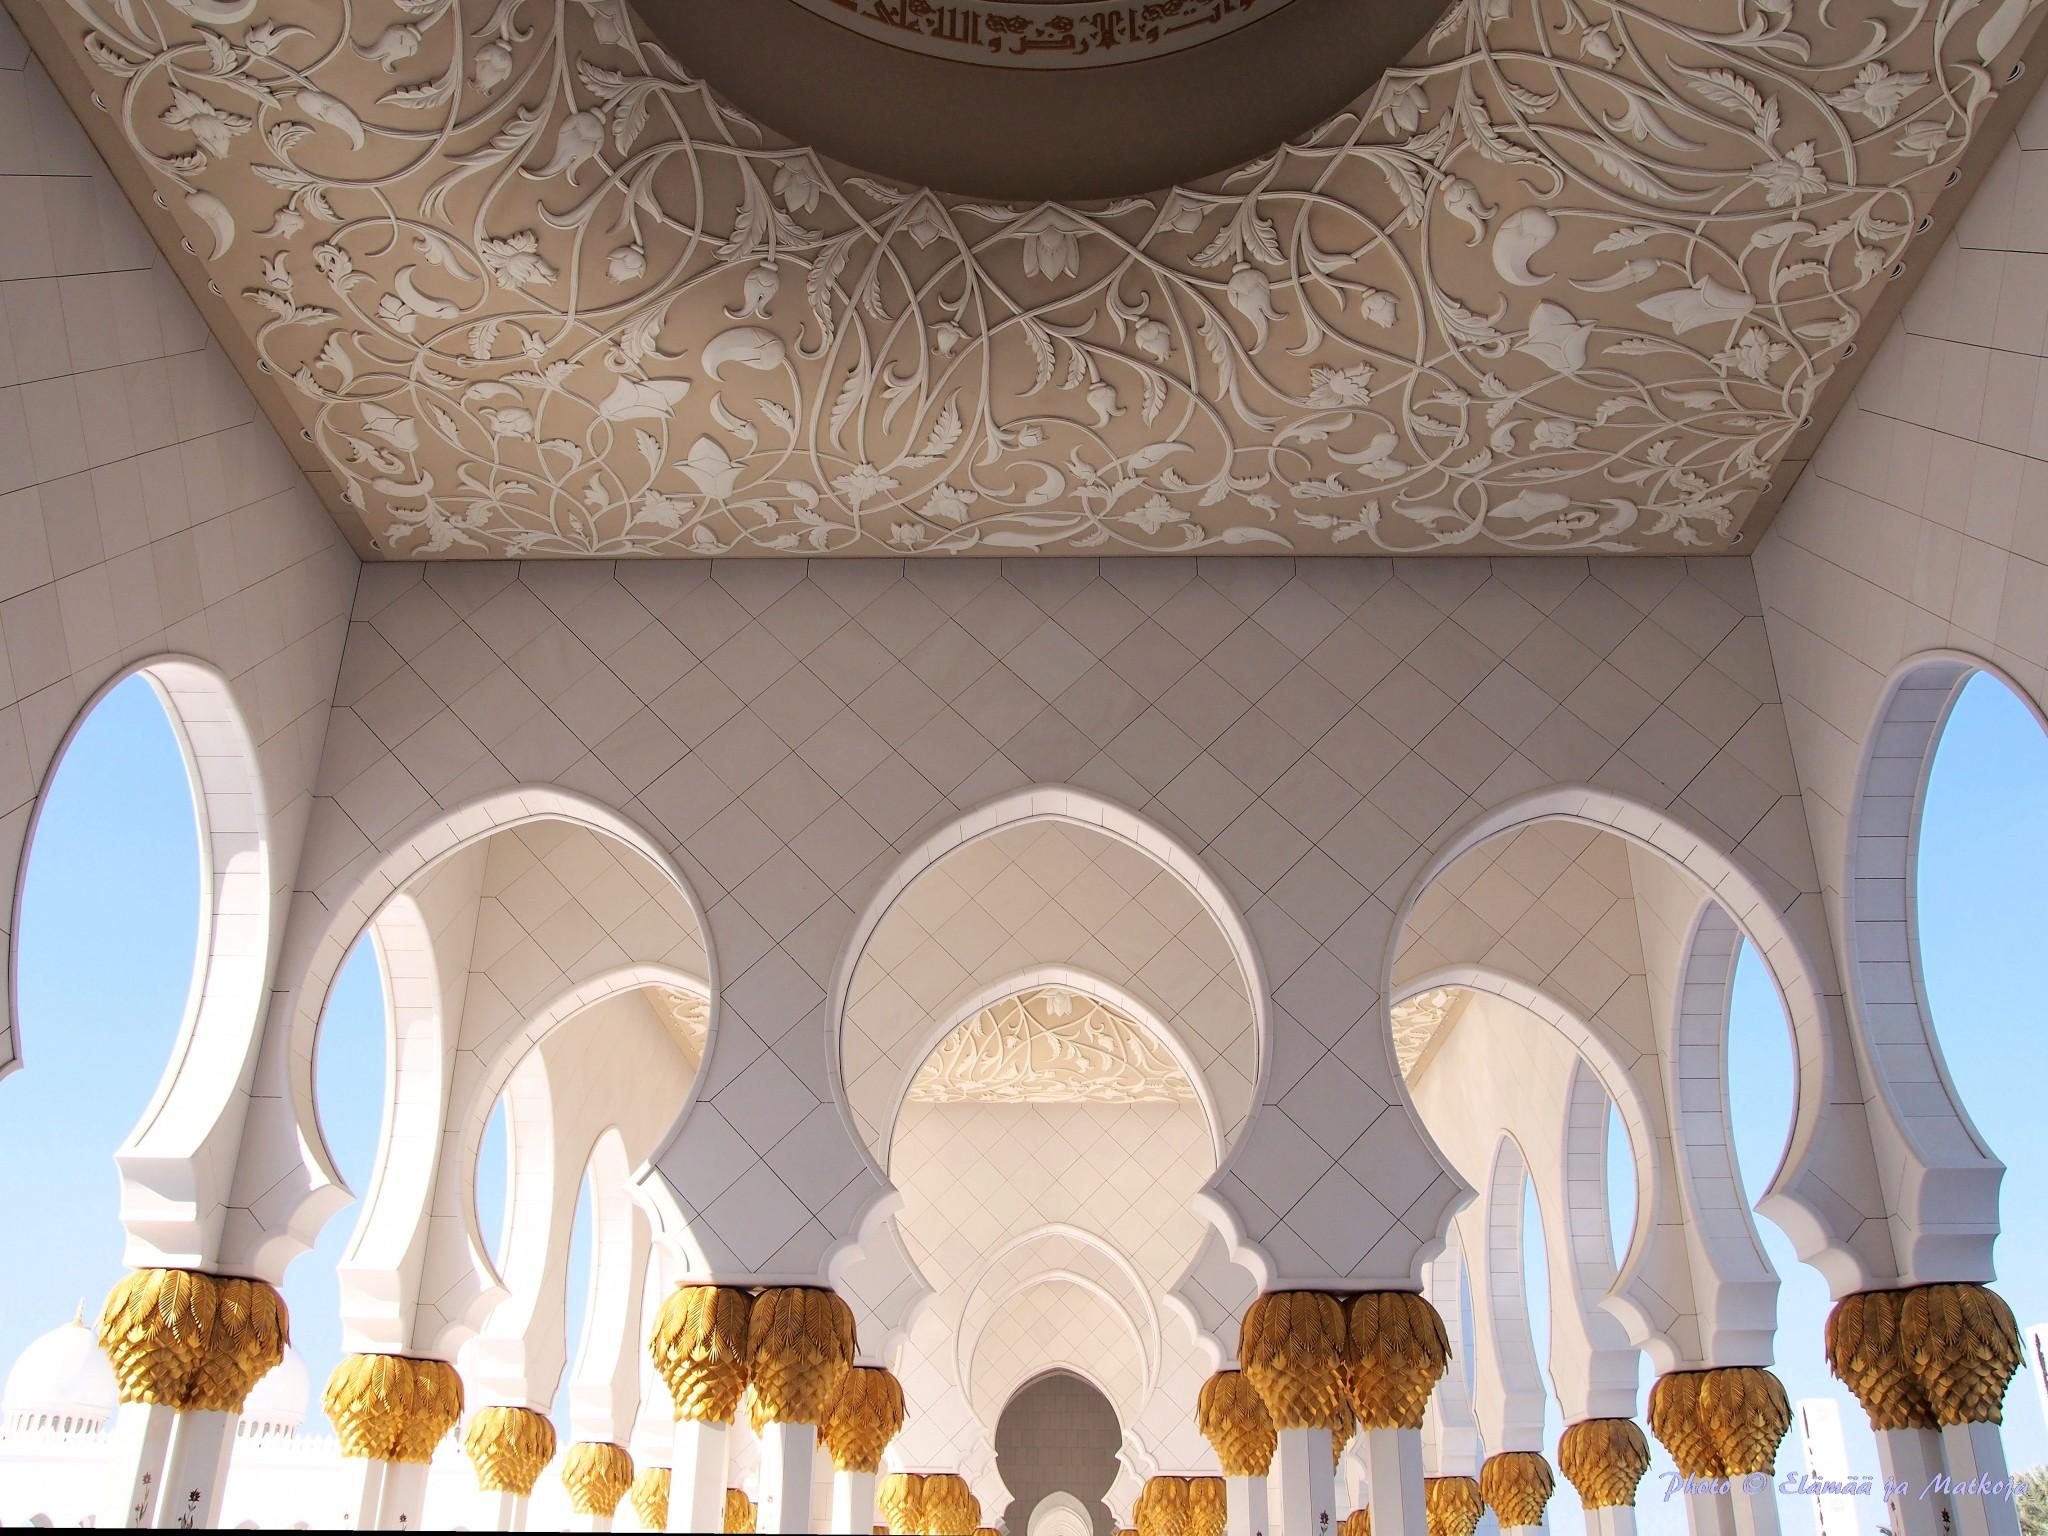 Sheikh Zayed Grand Mosque Abu Dhabi UAE 9 Photo © Elämää ja Matkoja